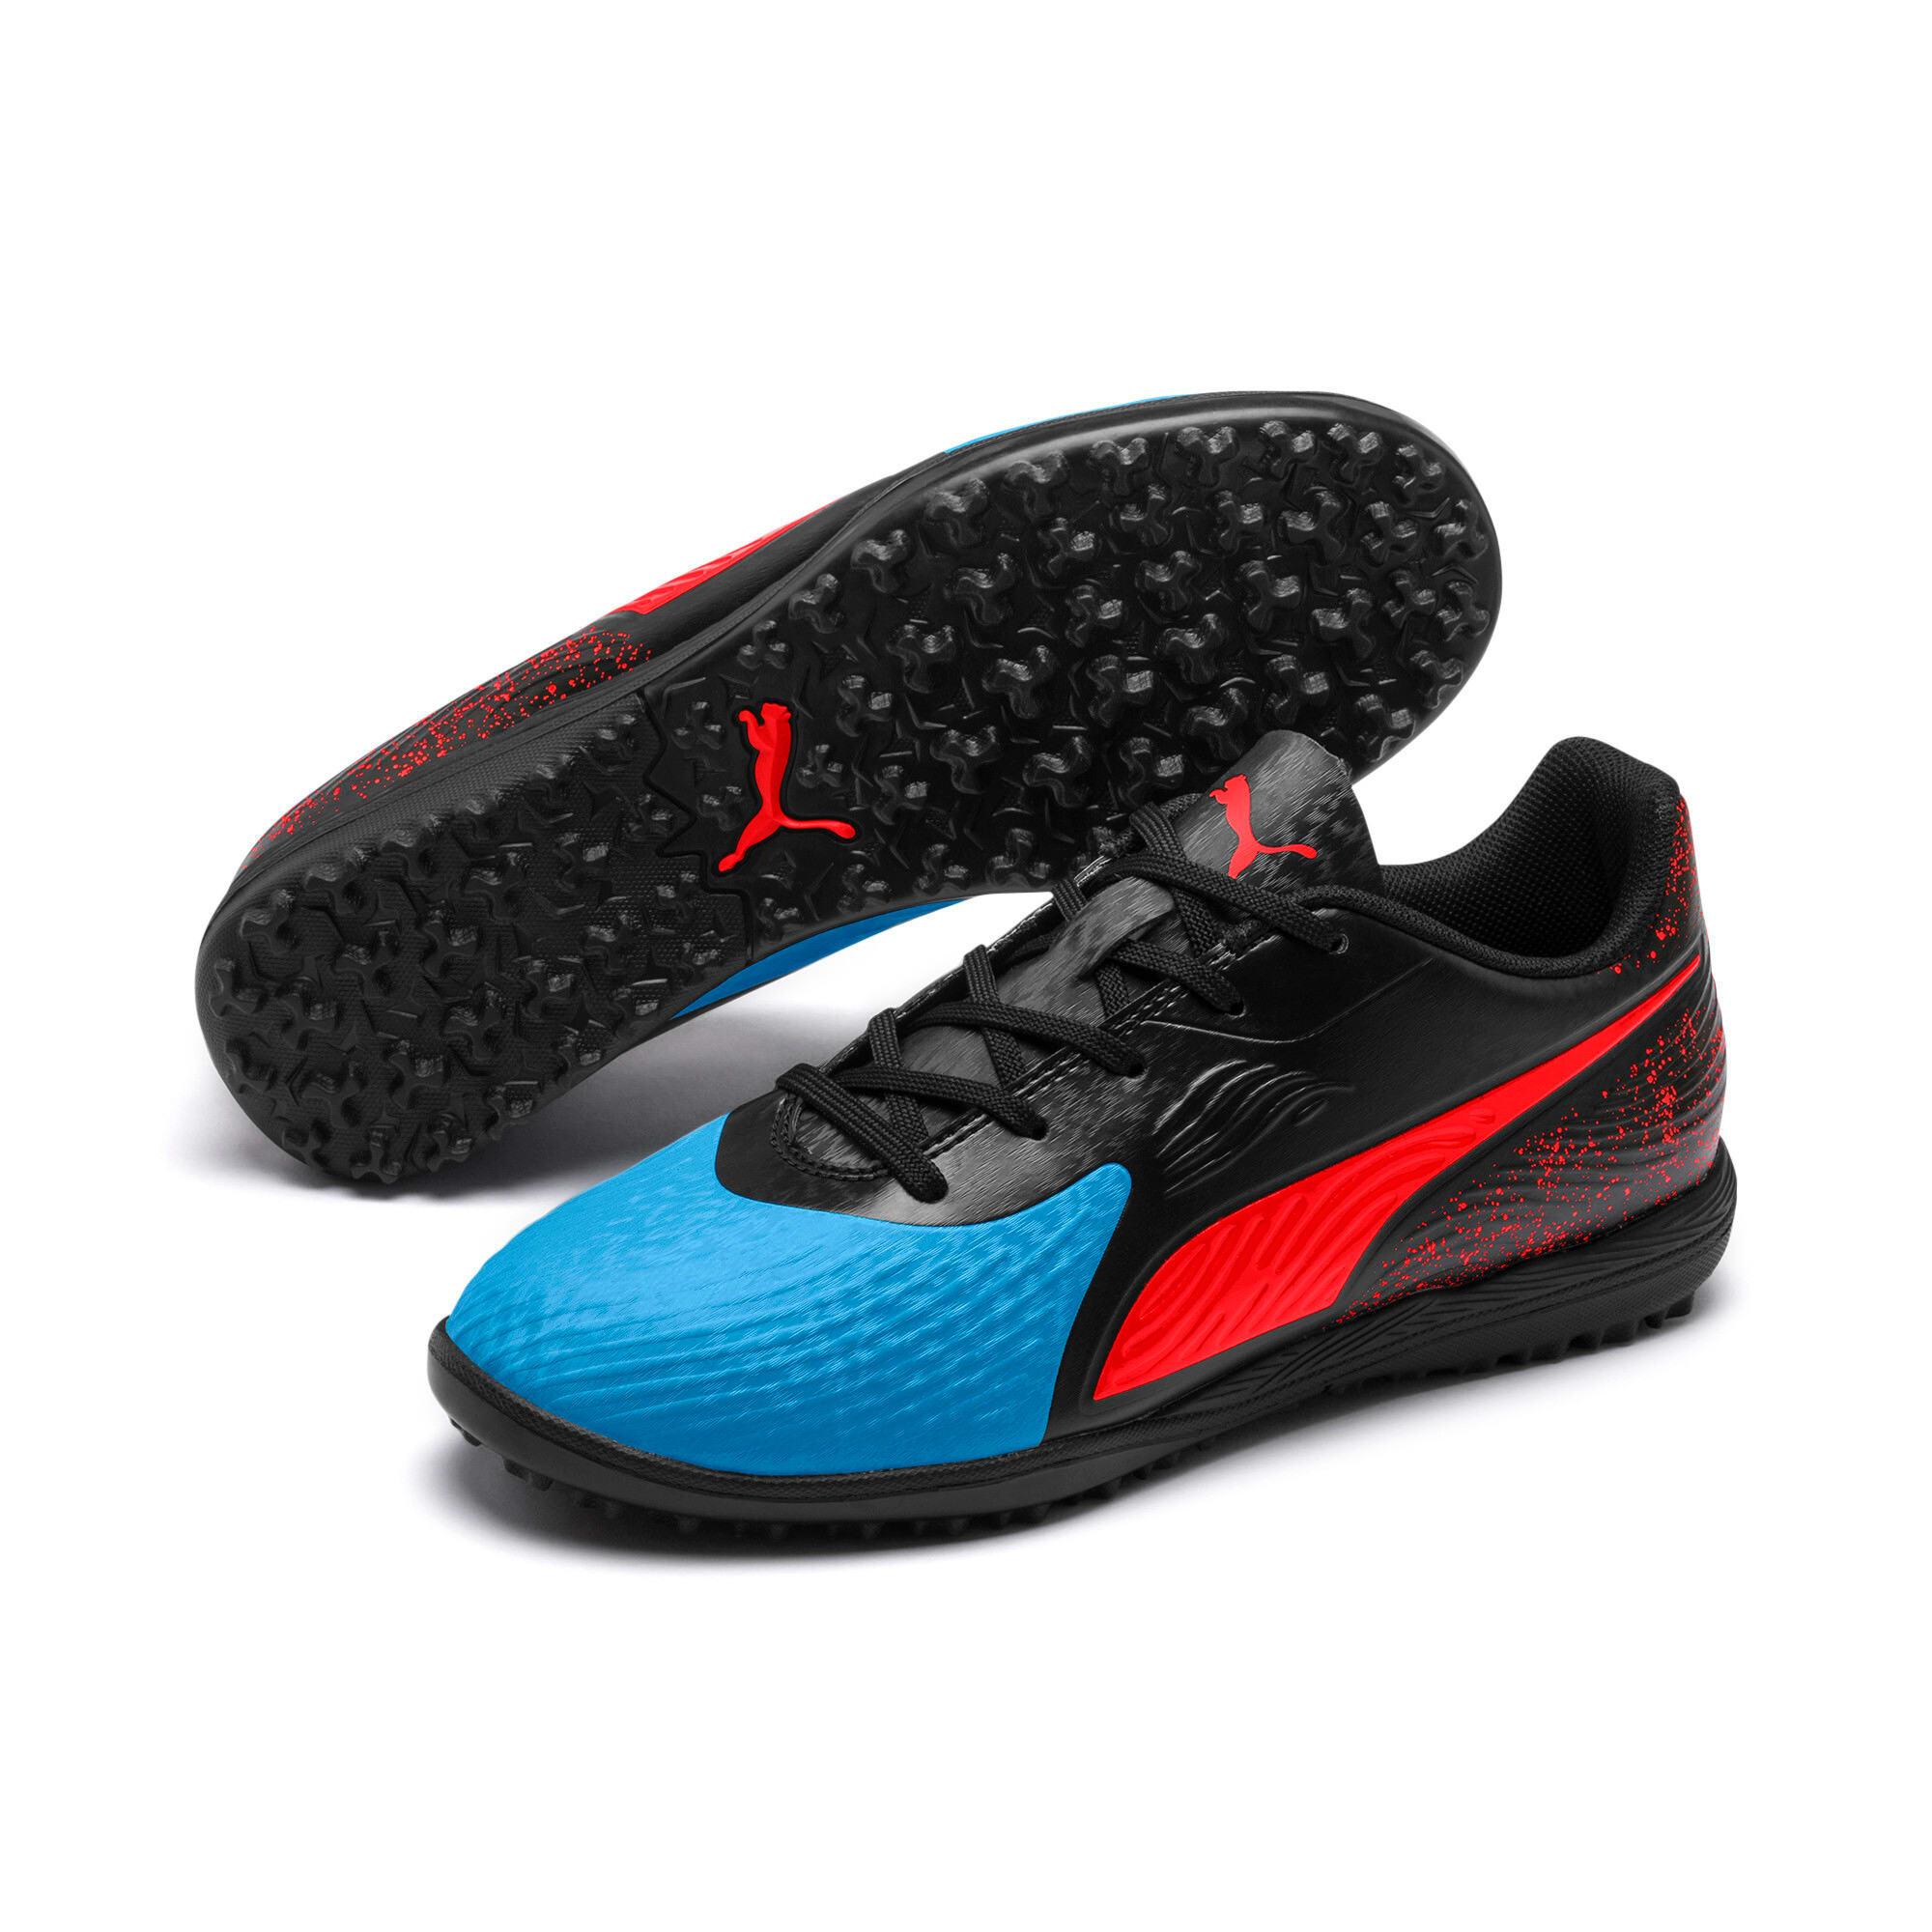 Thumbnail 2 of PUMA ONE 19.4 TT Soccer Shoes JR, Bleu Azur-Red Blast-Black, medium